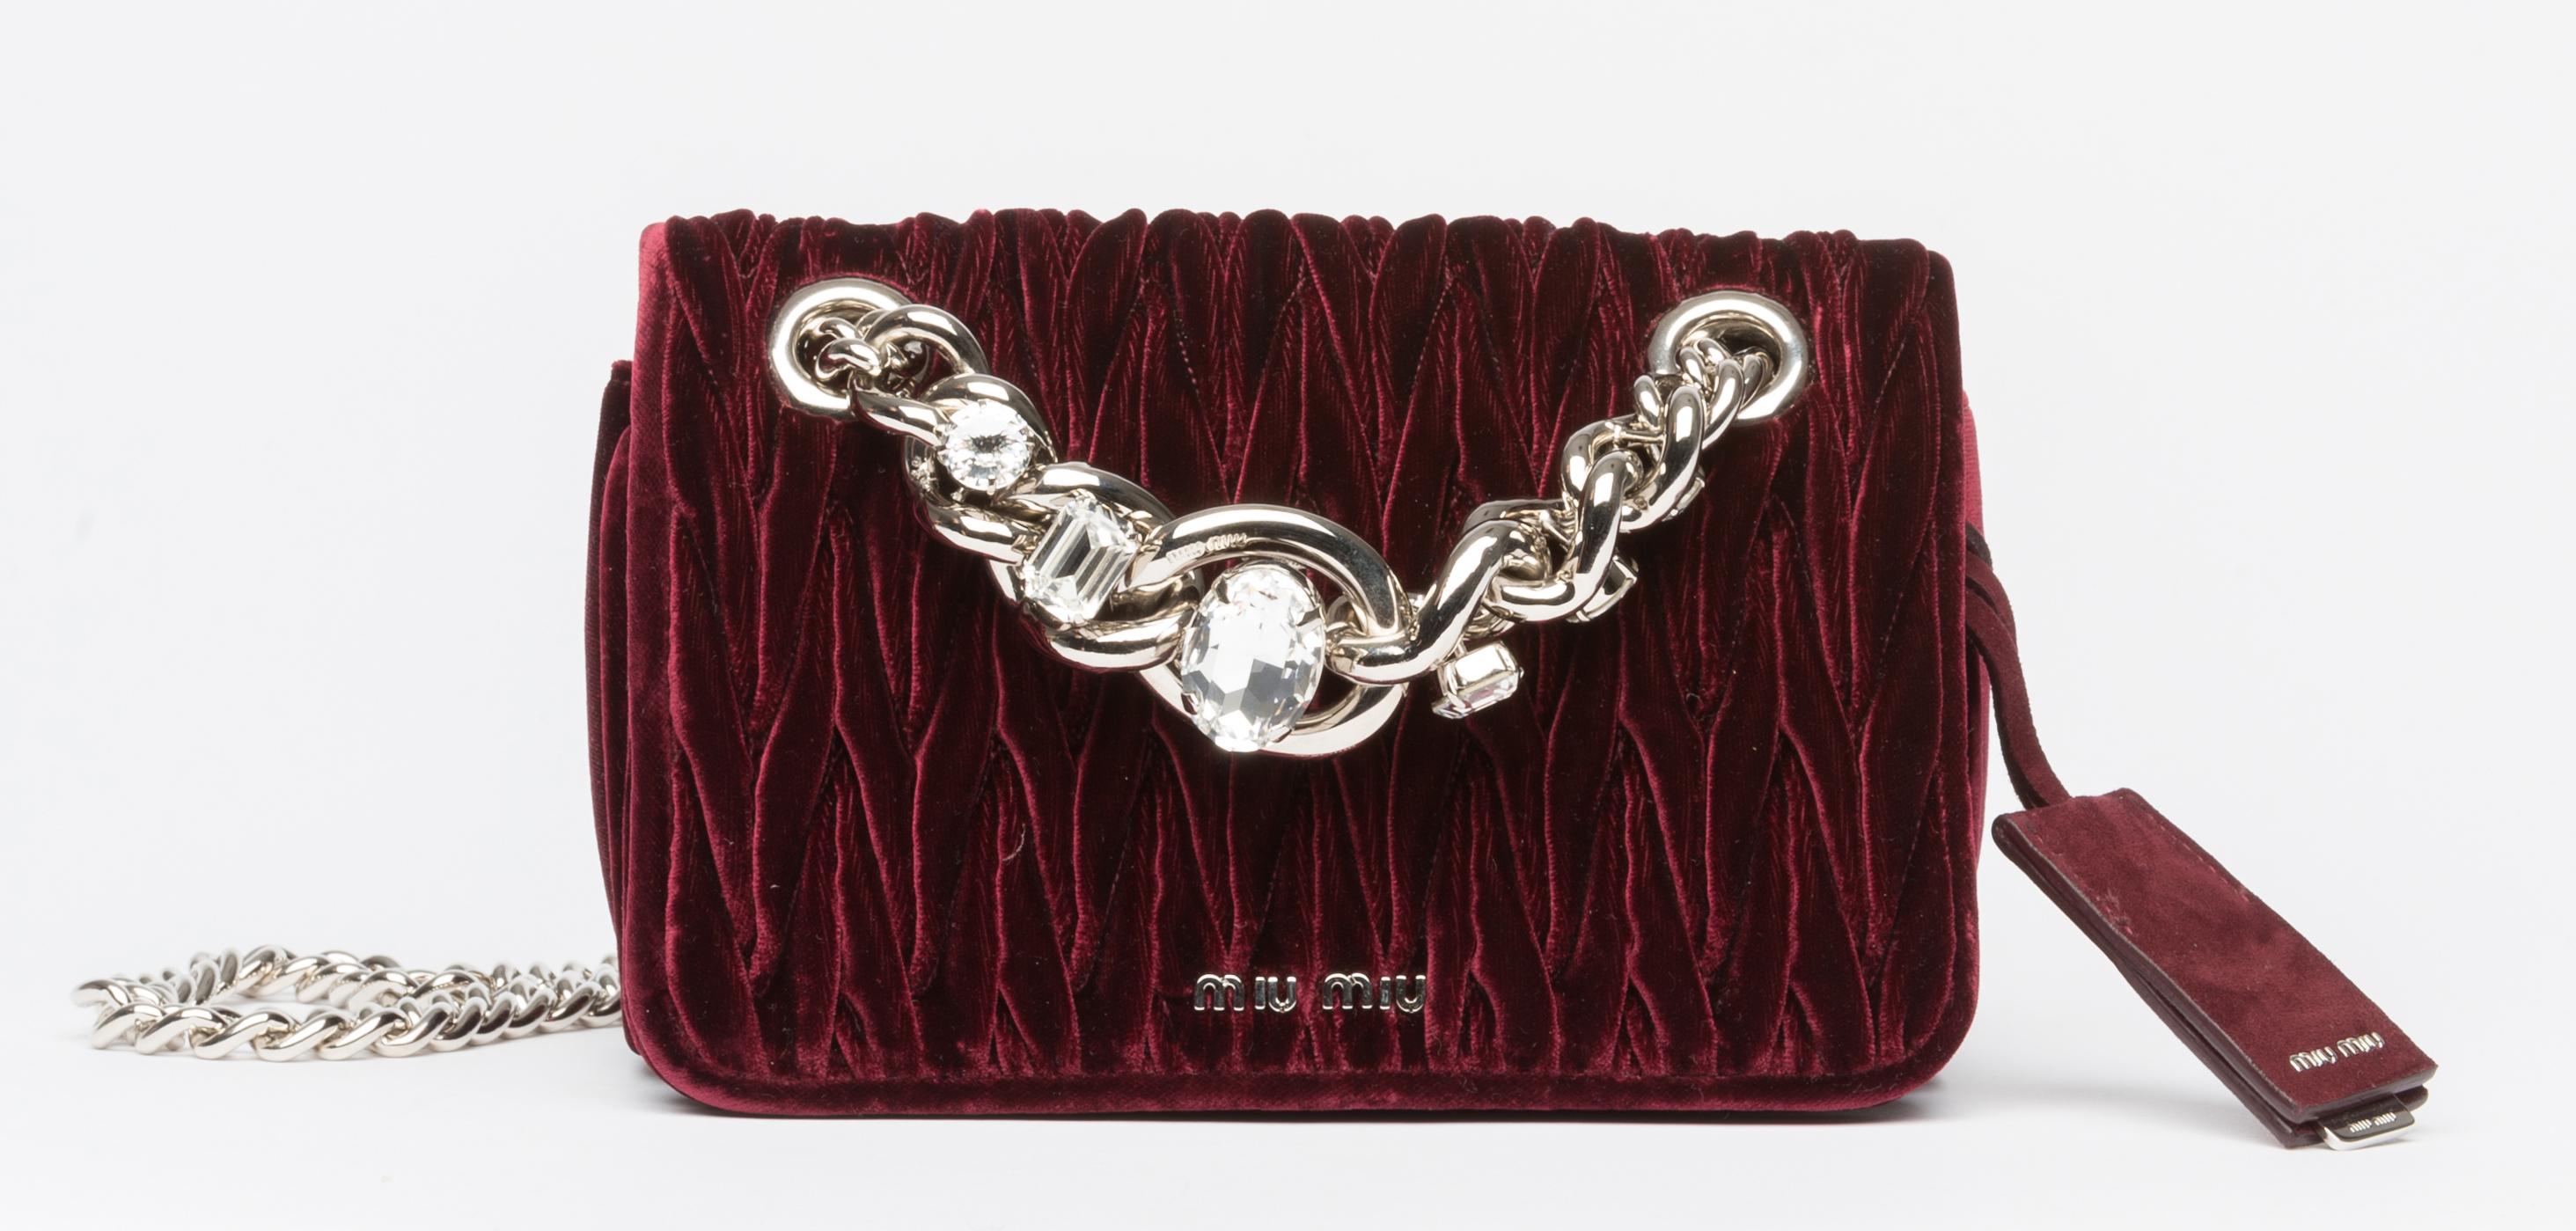 Velvet bag, MIU MIU.